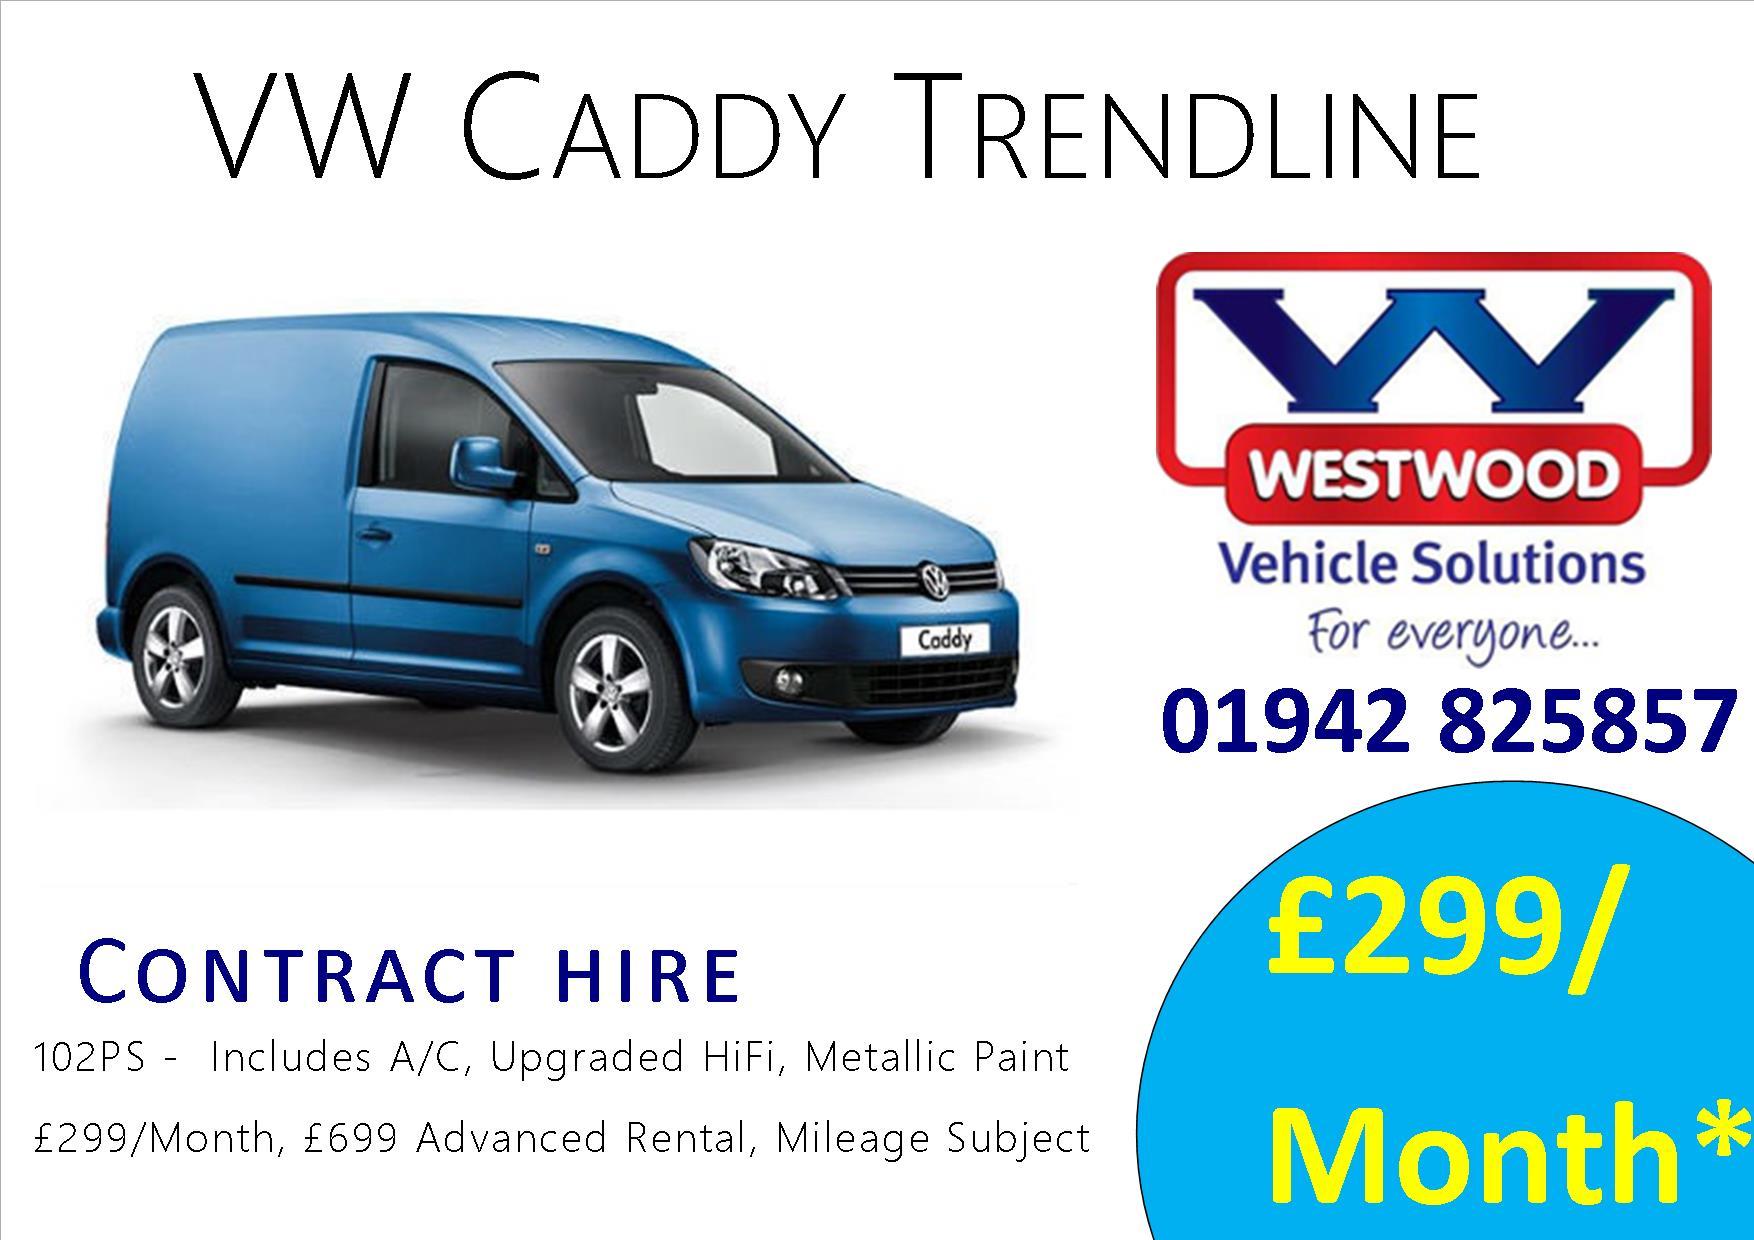 caddy-trendline-advert